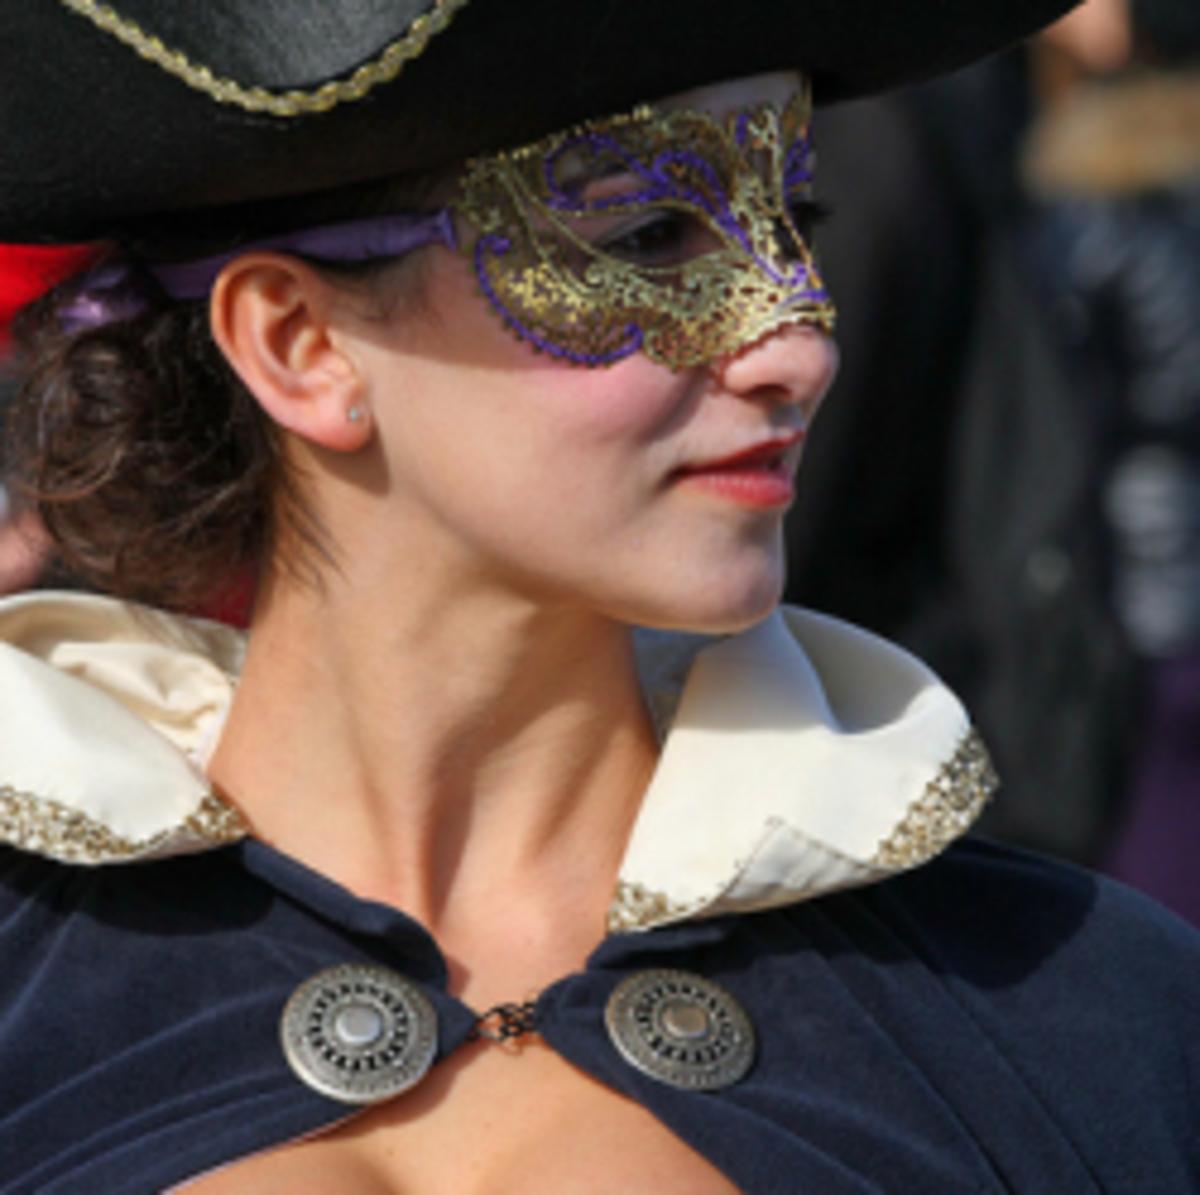 Best Halloween Costumes for Curvy Women